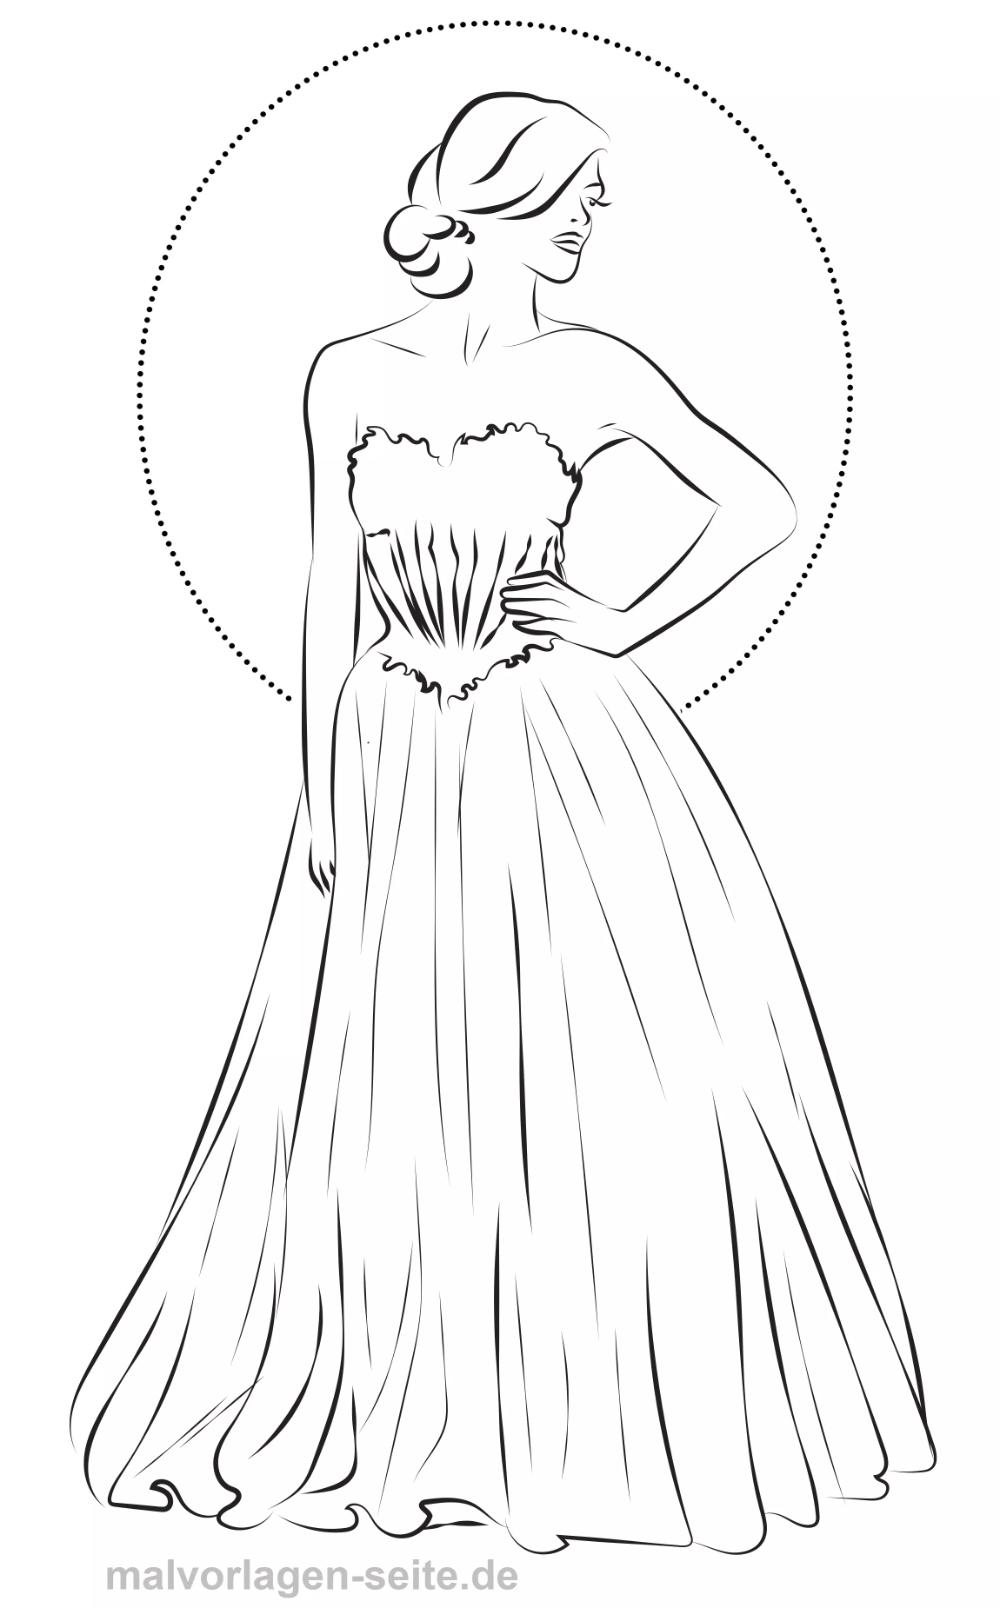 Malvorlage Mode Abendkleid Gratis Malvorlagen Zum Shabby Chic Crochet Female Sketch Drawing Inspiration